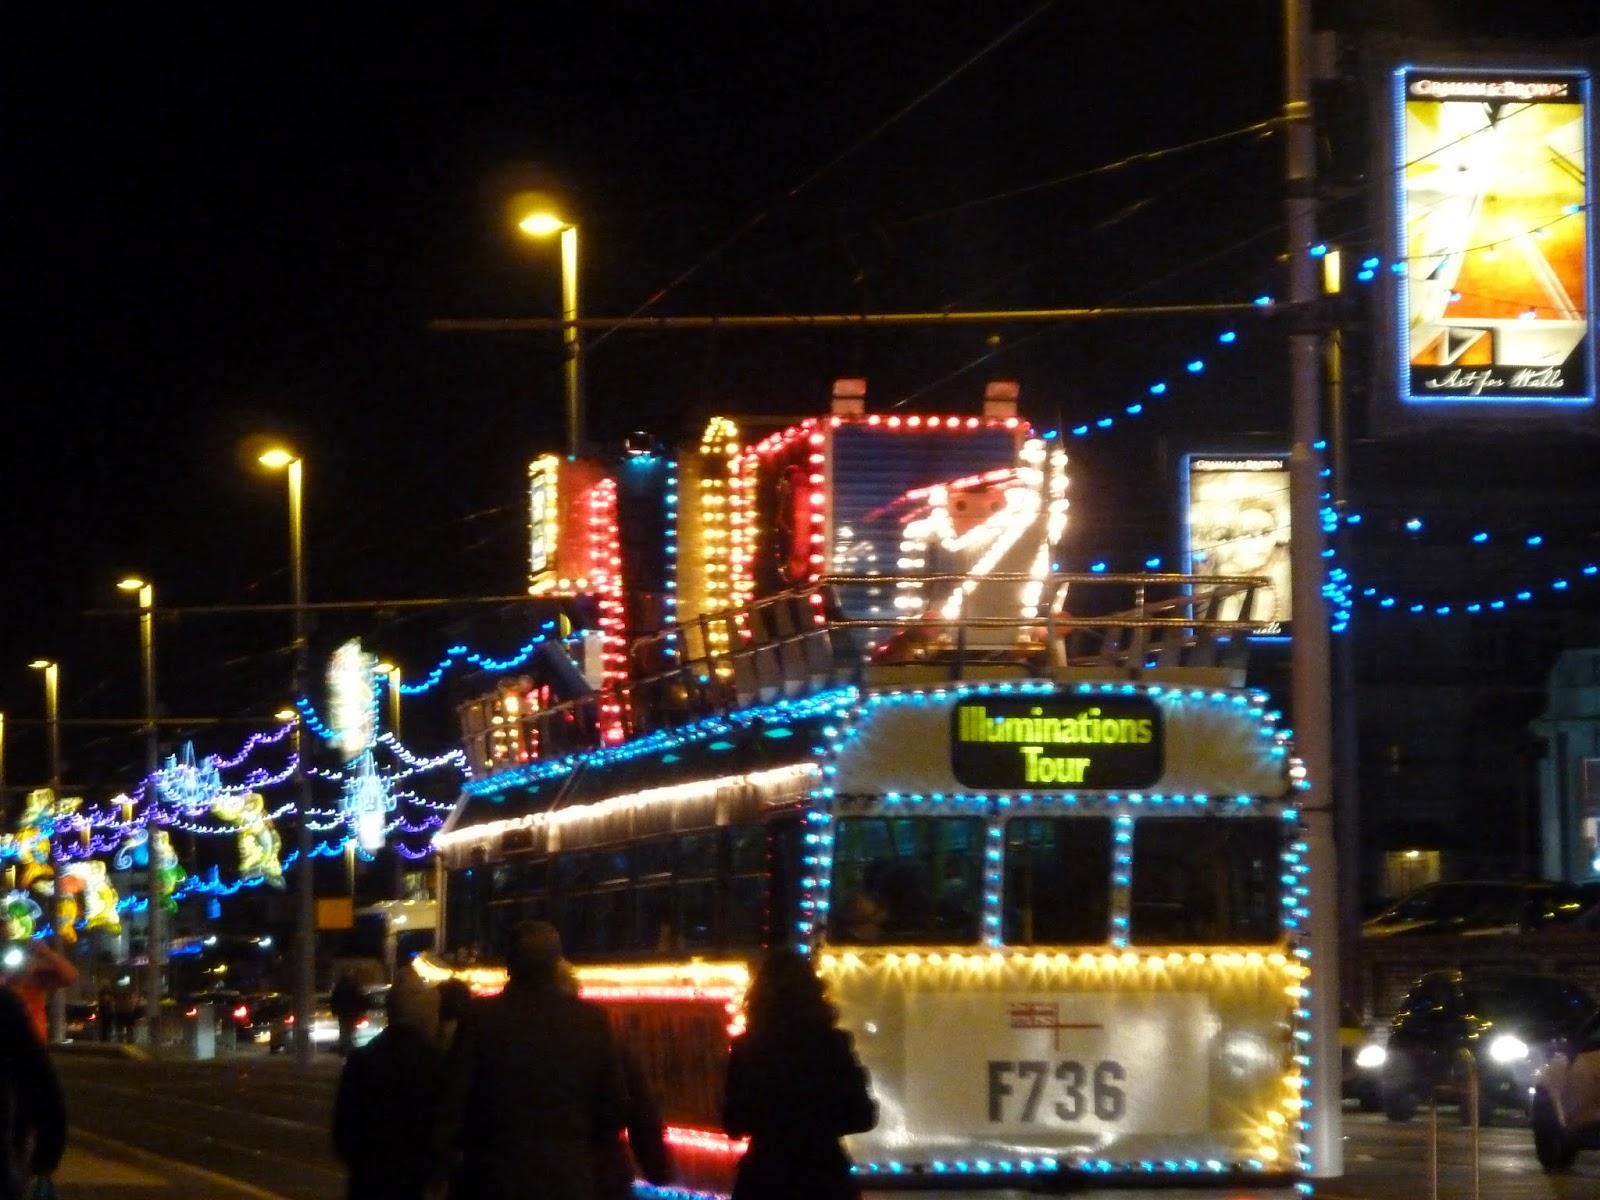 Blackpool Illuminations Tour